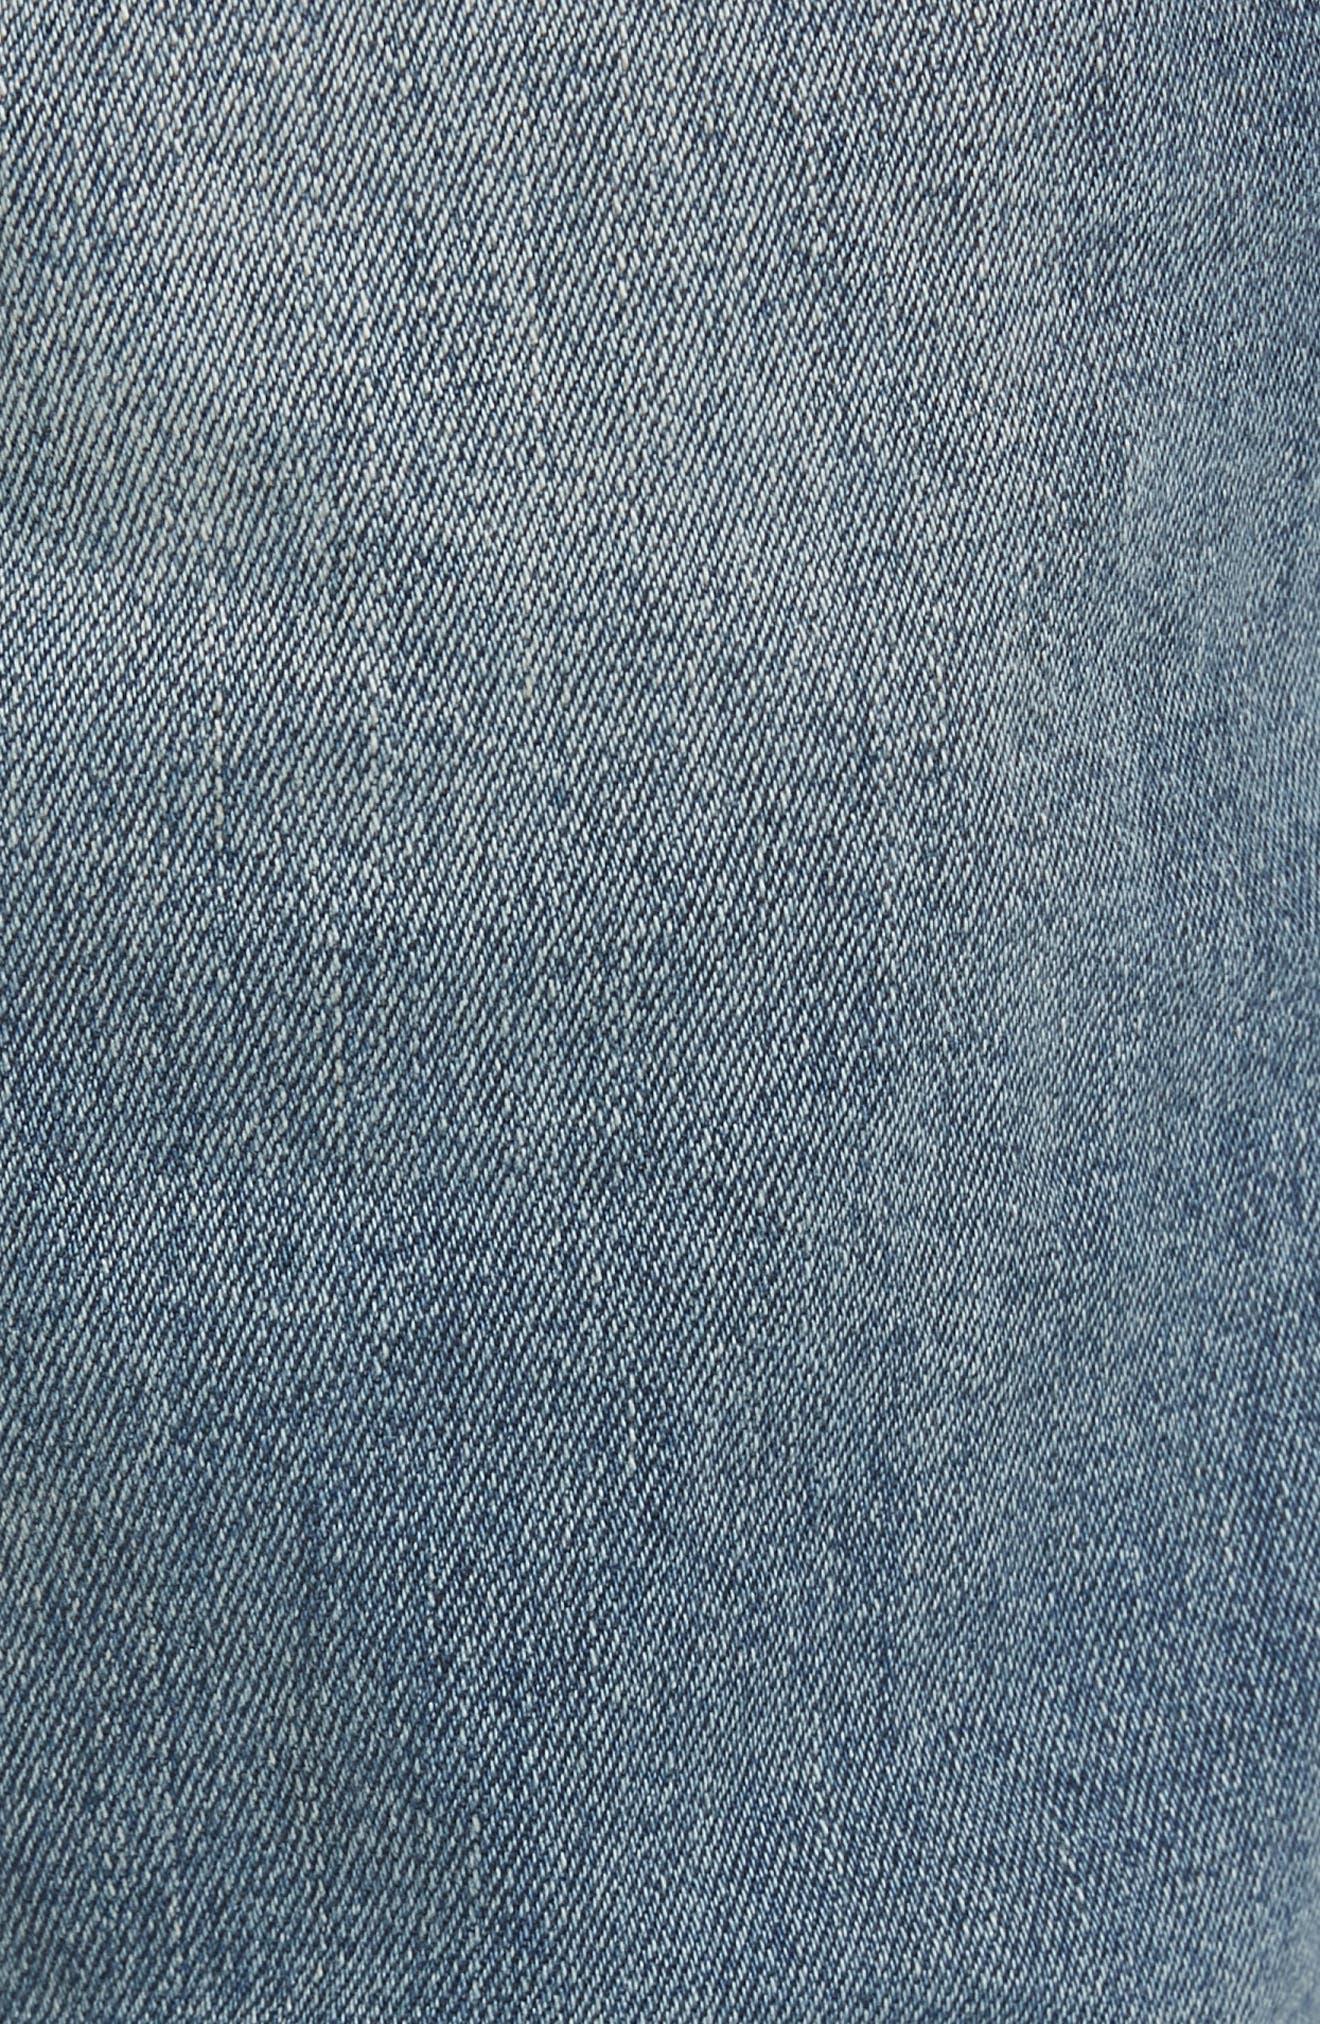 Snap Skinny Fit Jeans,                             Alternate thumbnail 5, color,                             LIGHT OLD DESTROY